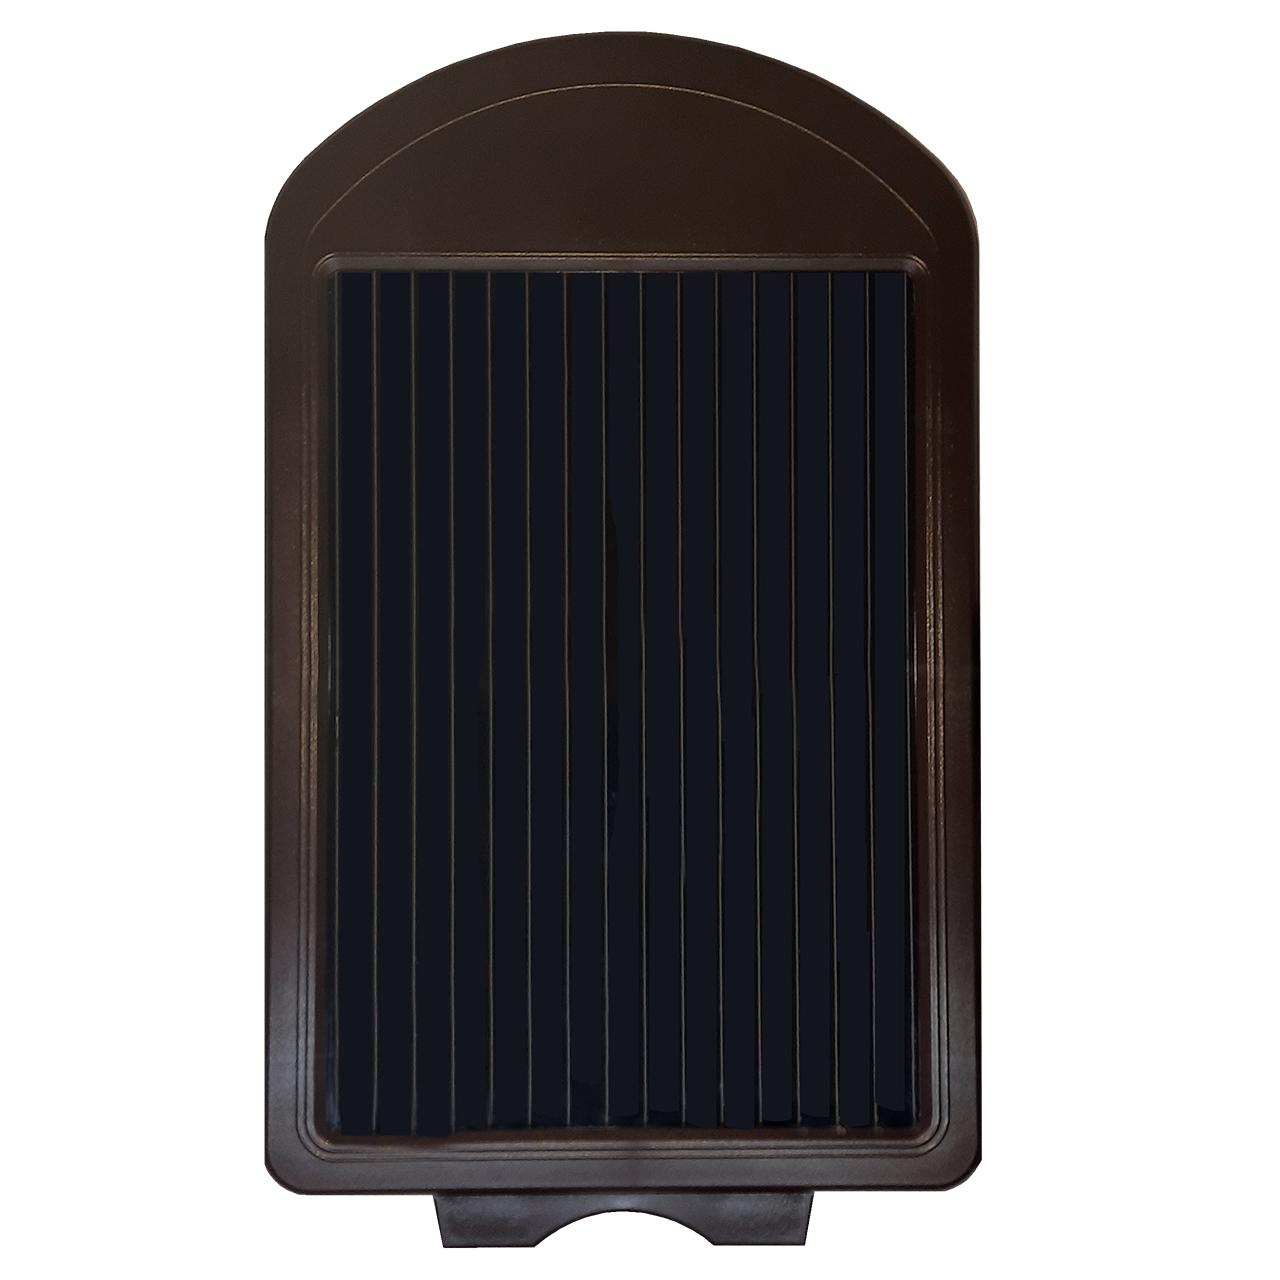 چراغ پارکی خورشیدی مدل SO-40